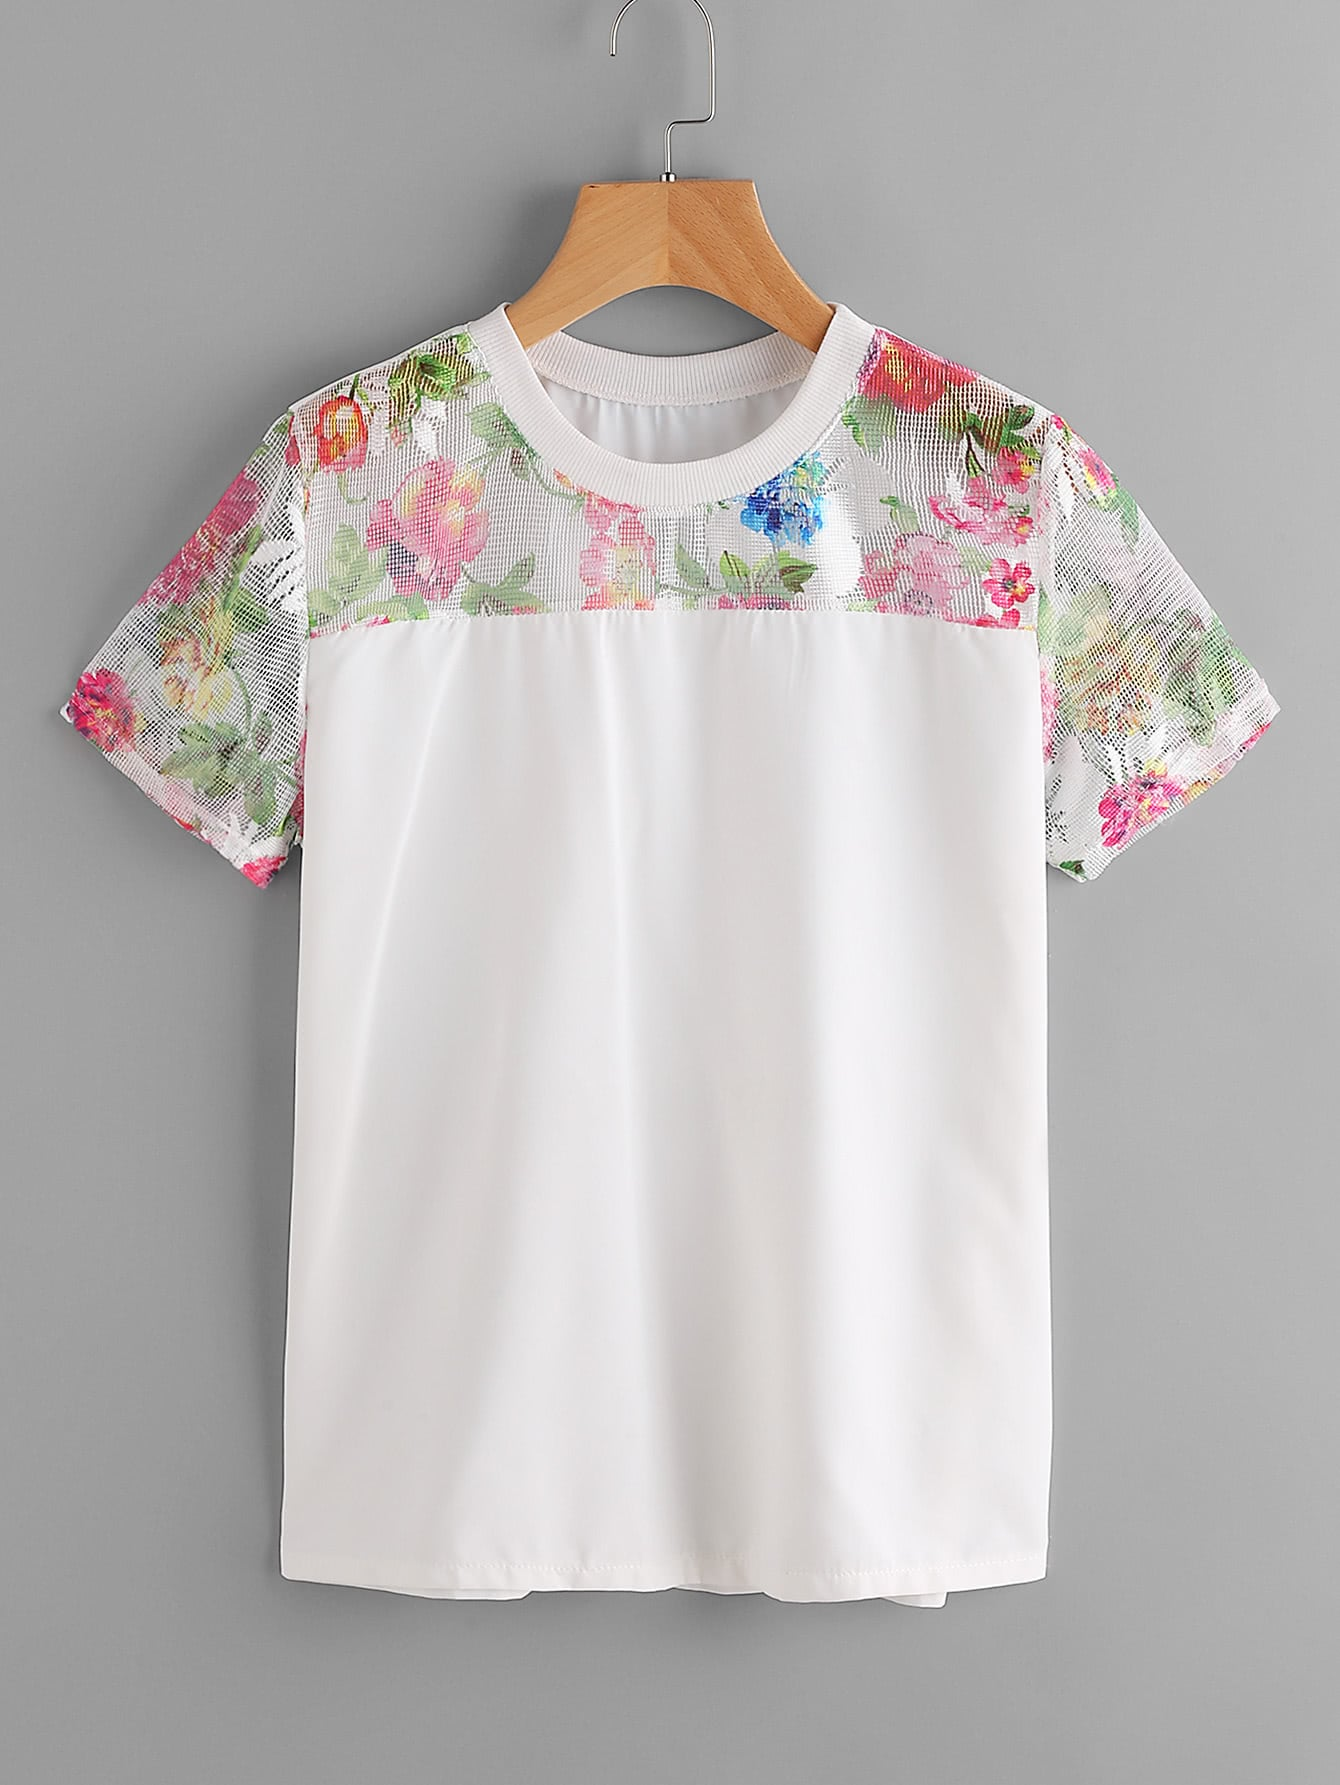 blouse170601107_2